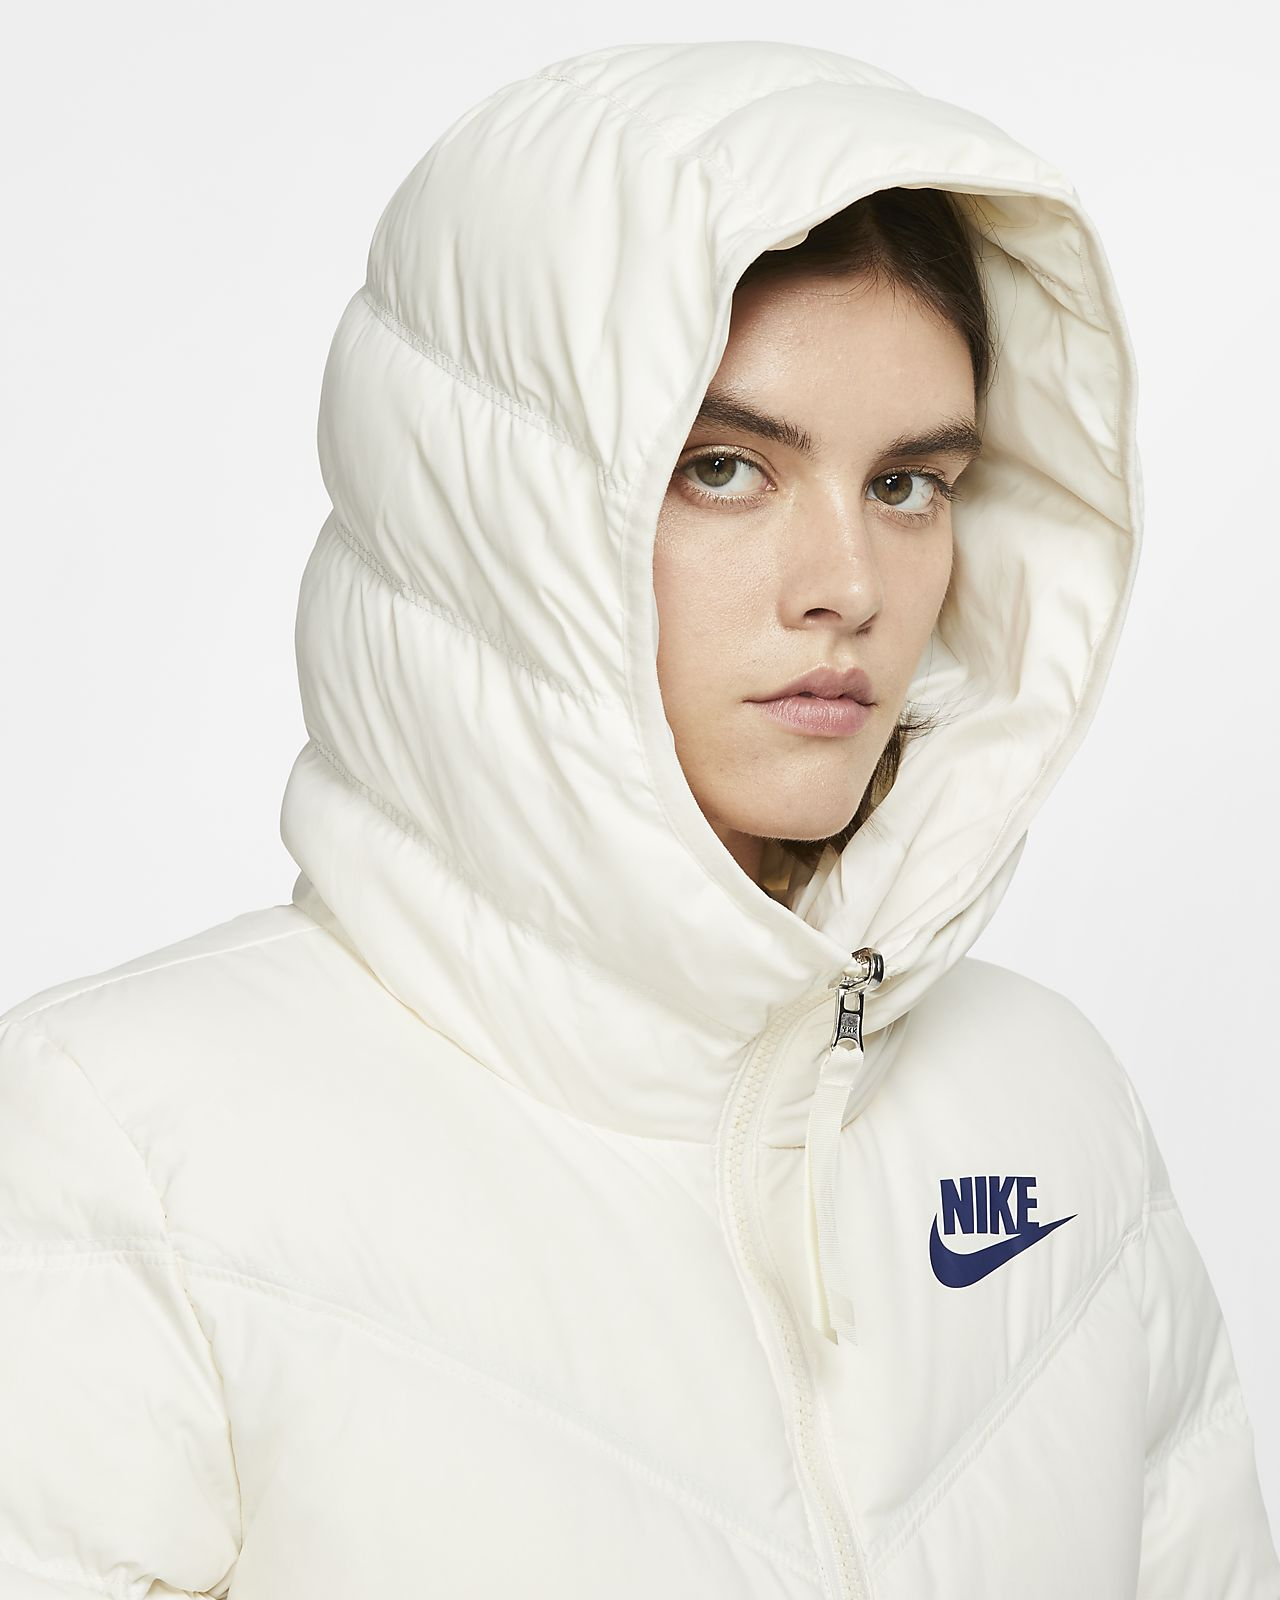 nike sko Udsalg tilbud, Nike Sportswear Dunjakker Damer Tøj